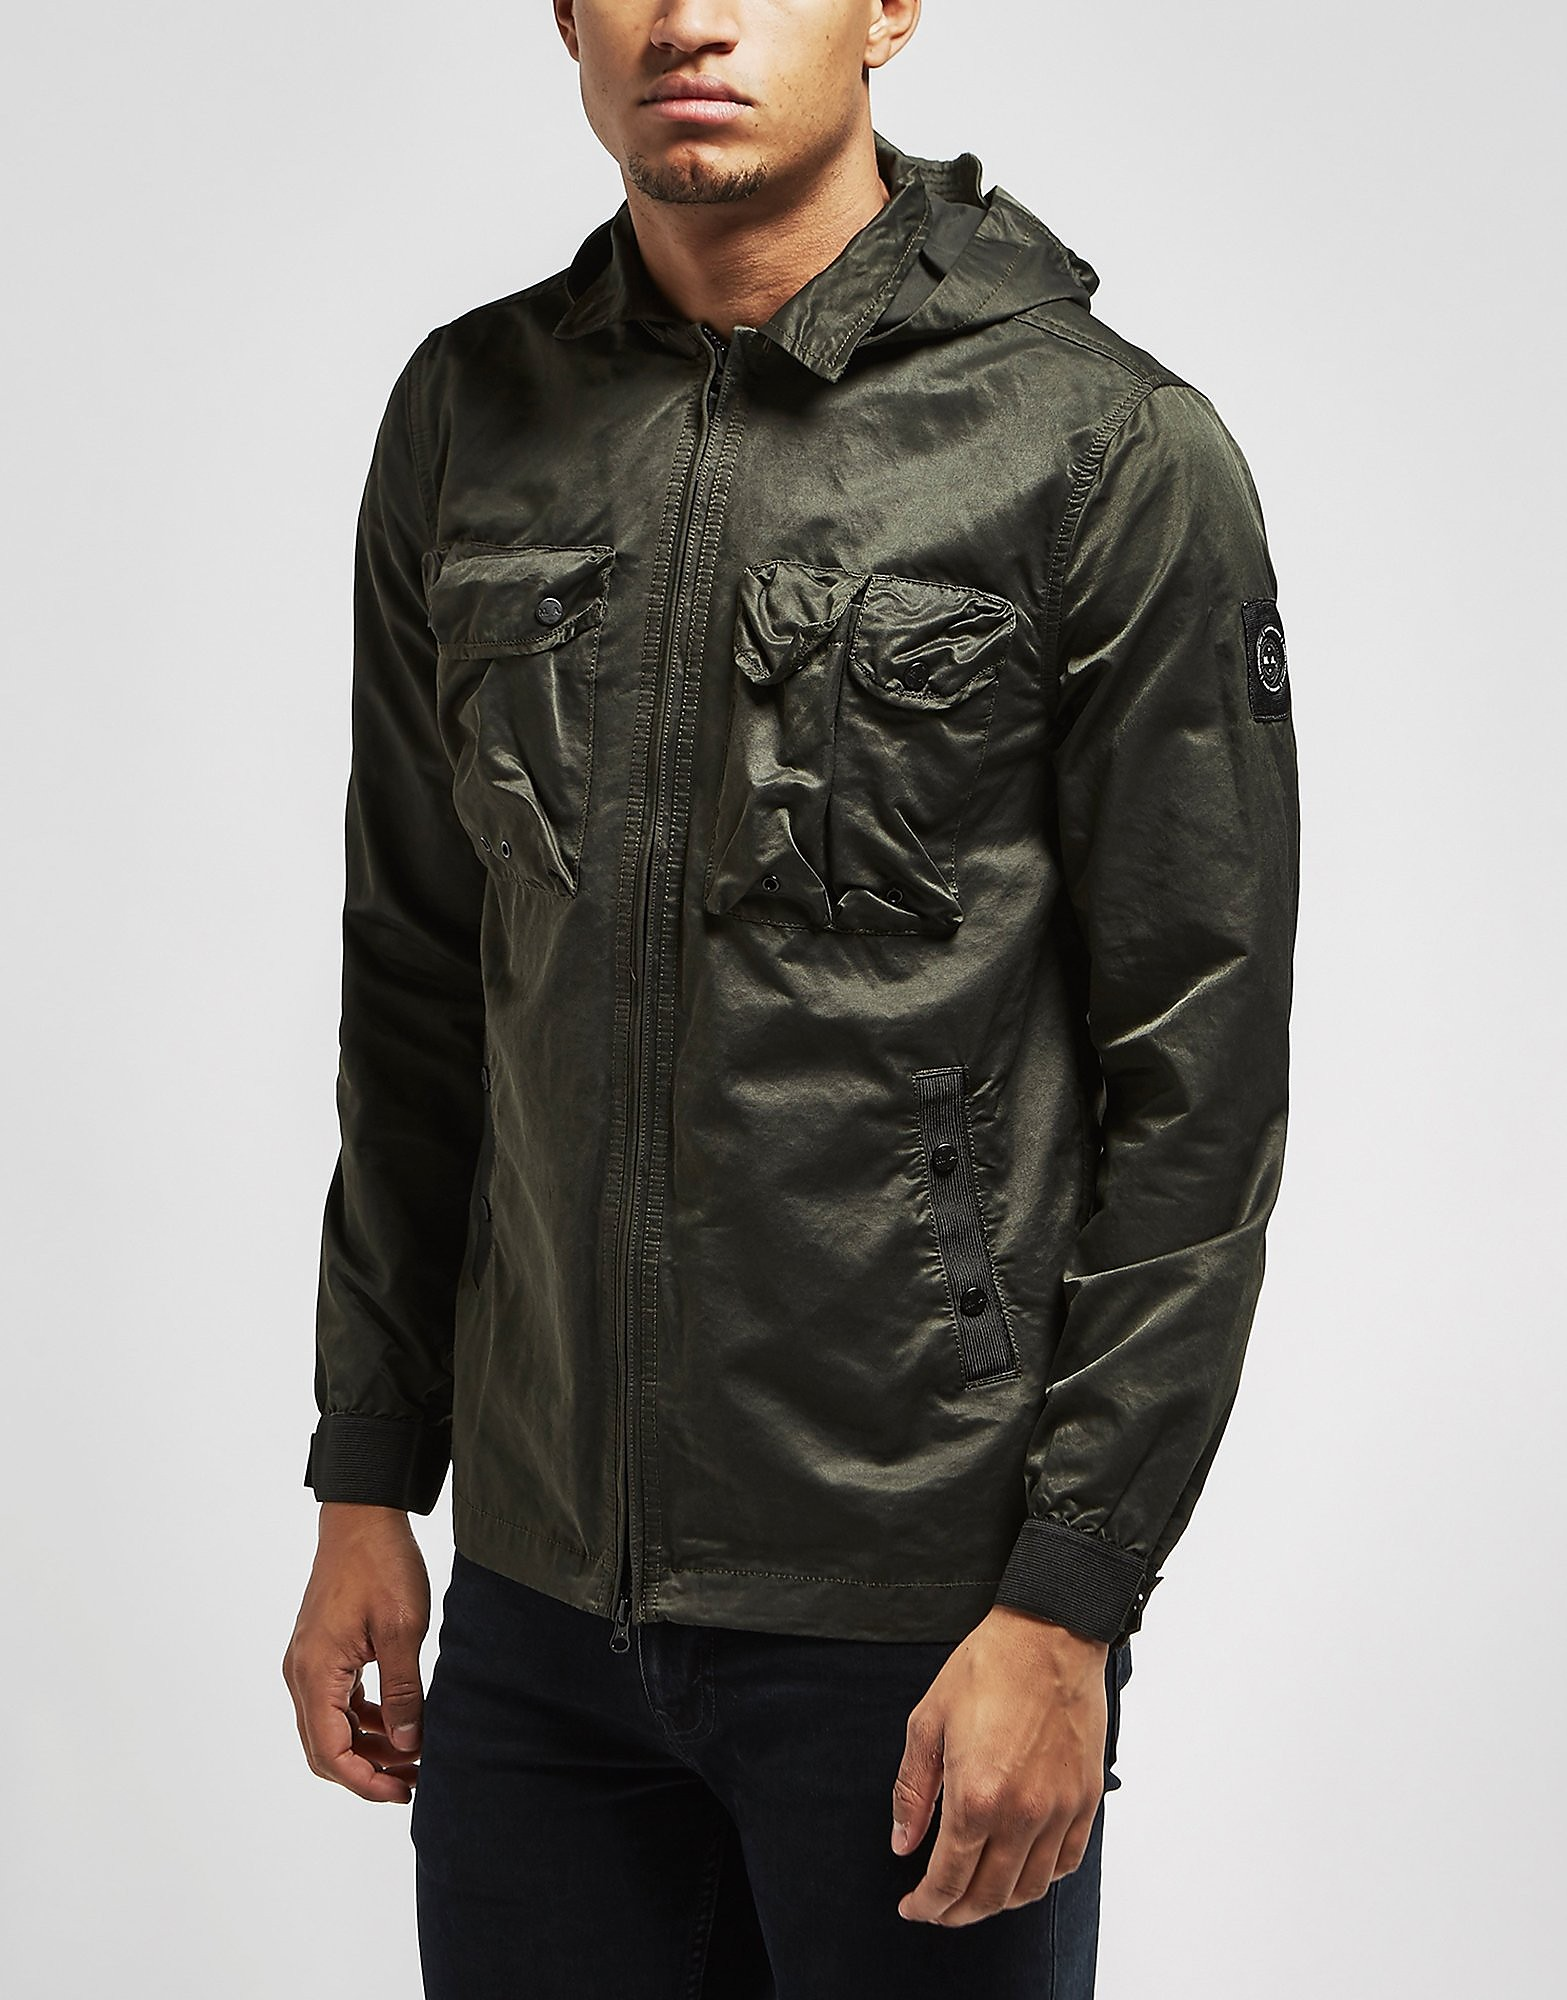 Marshall Artist Pigment Dyed Lightweight Jacket